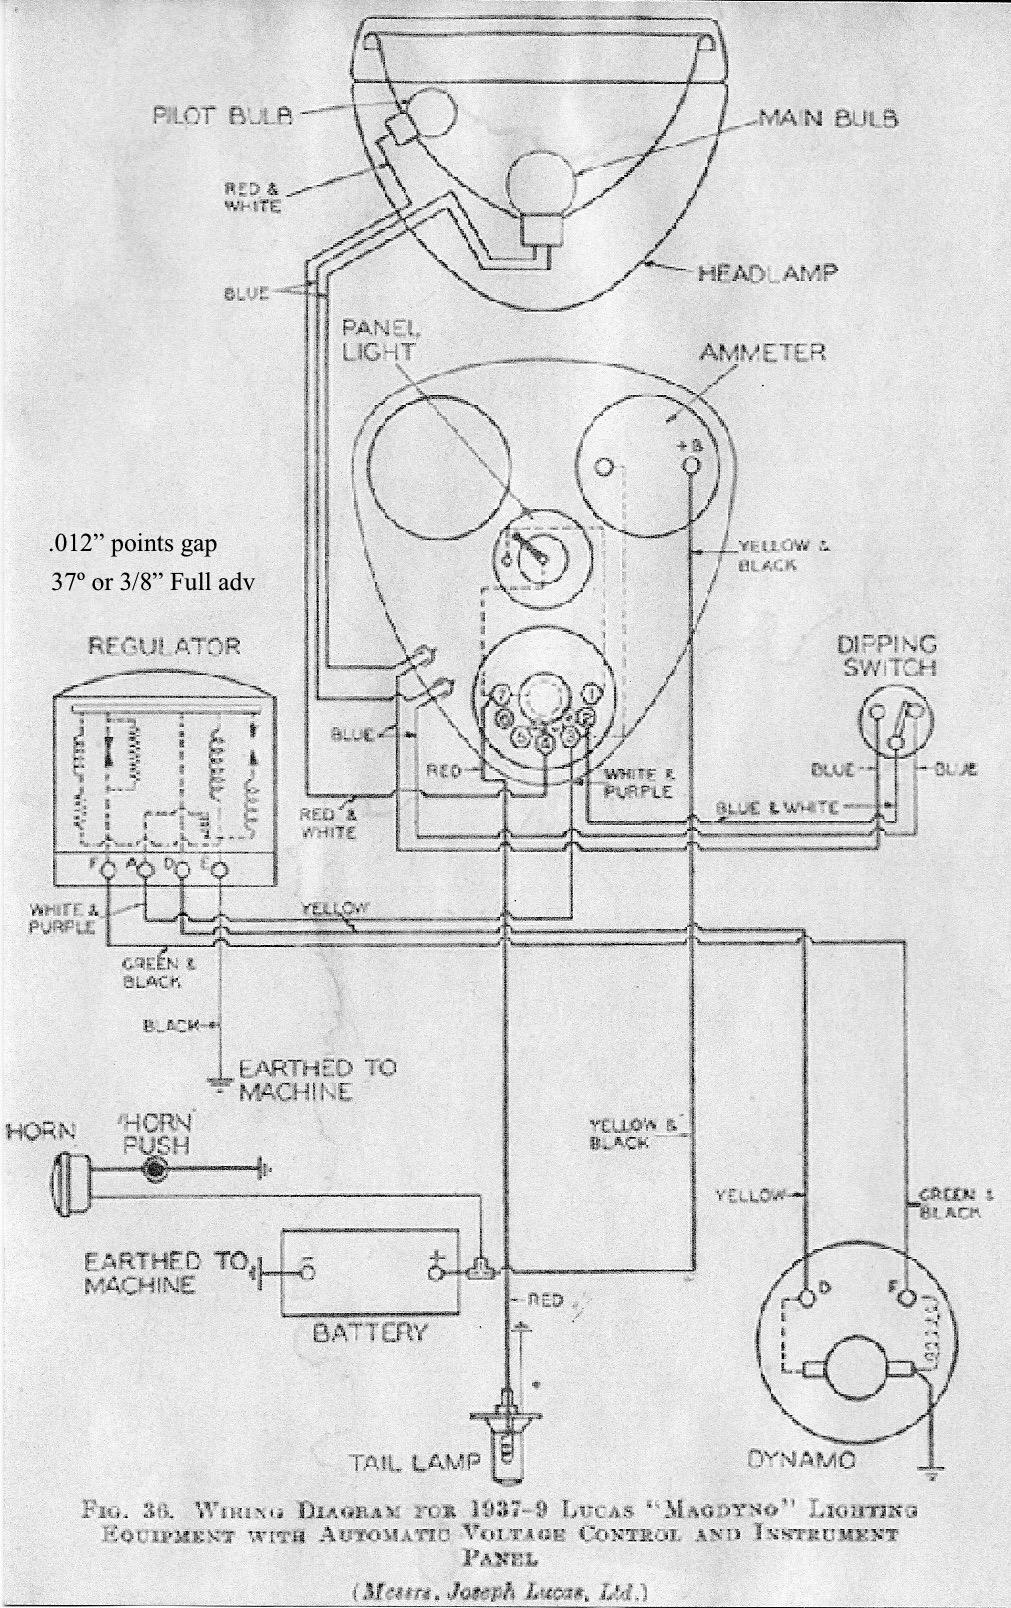 Terry Macdonald. 19379 Lucas Magdyno Diagram. Wiring. Twin Engine Triumph Diagram At Scoala.co